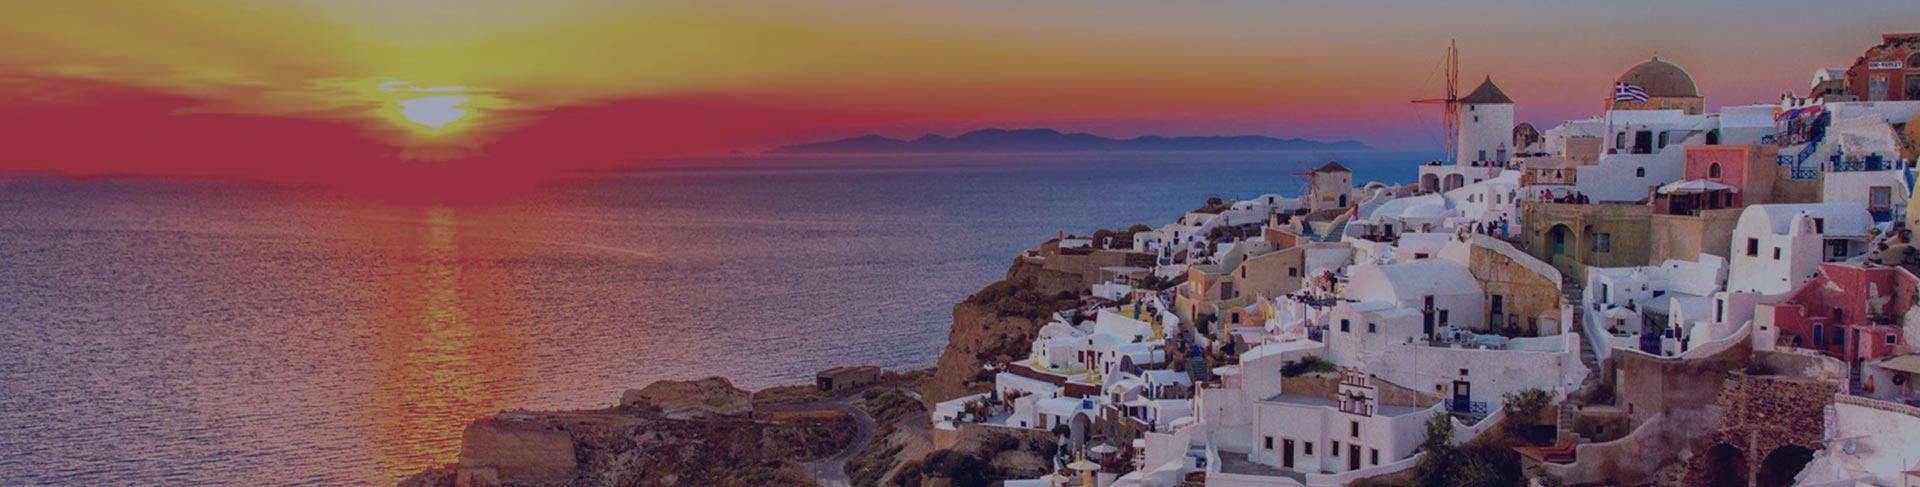 Santorini za letovanje vodič i zalazak Sunca